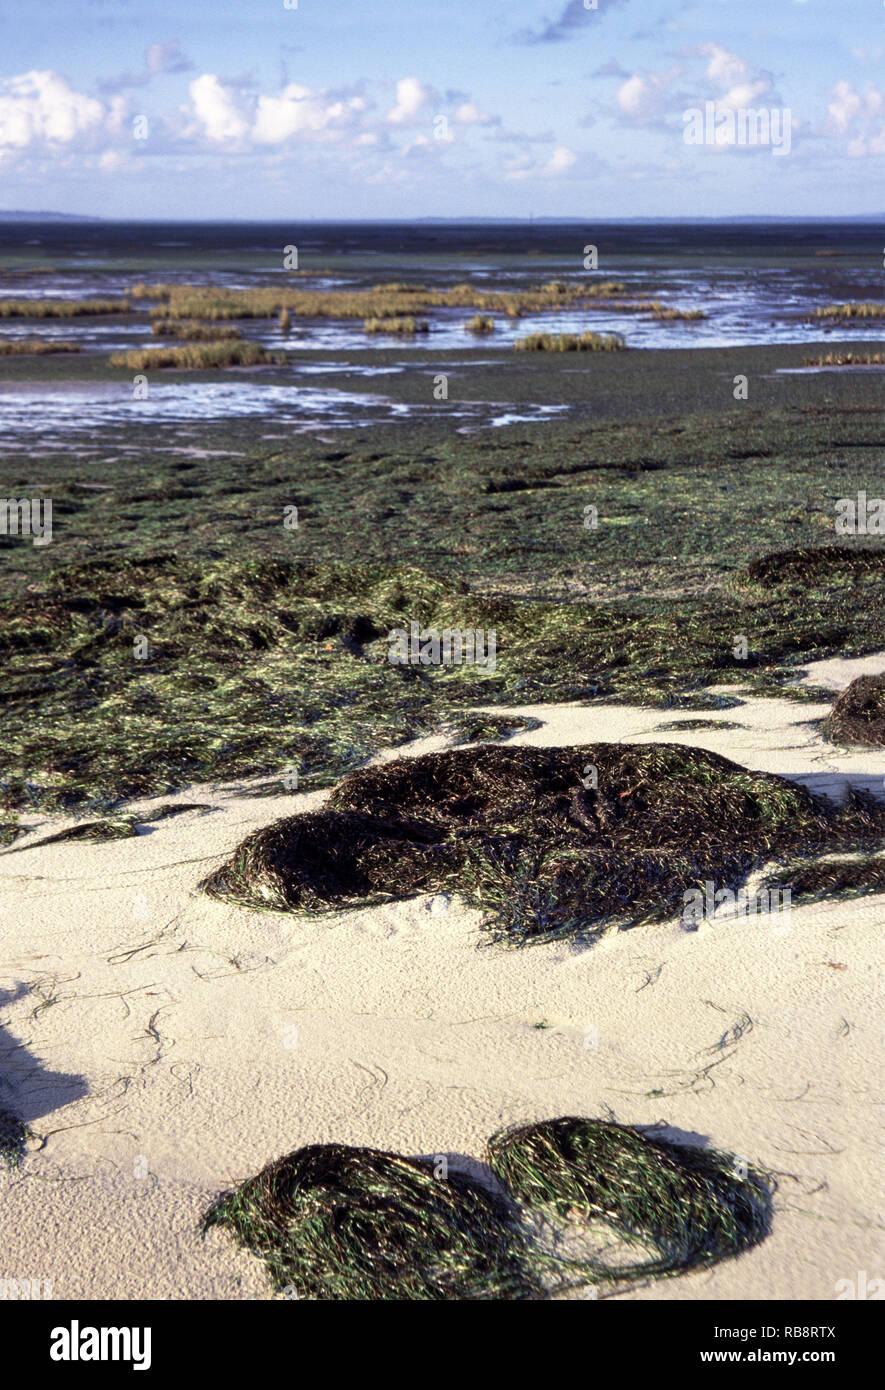 Salt marsh developing in Arcachon Bay.West coast France just below Bordeaux - Stock Image